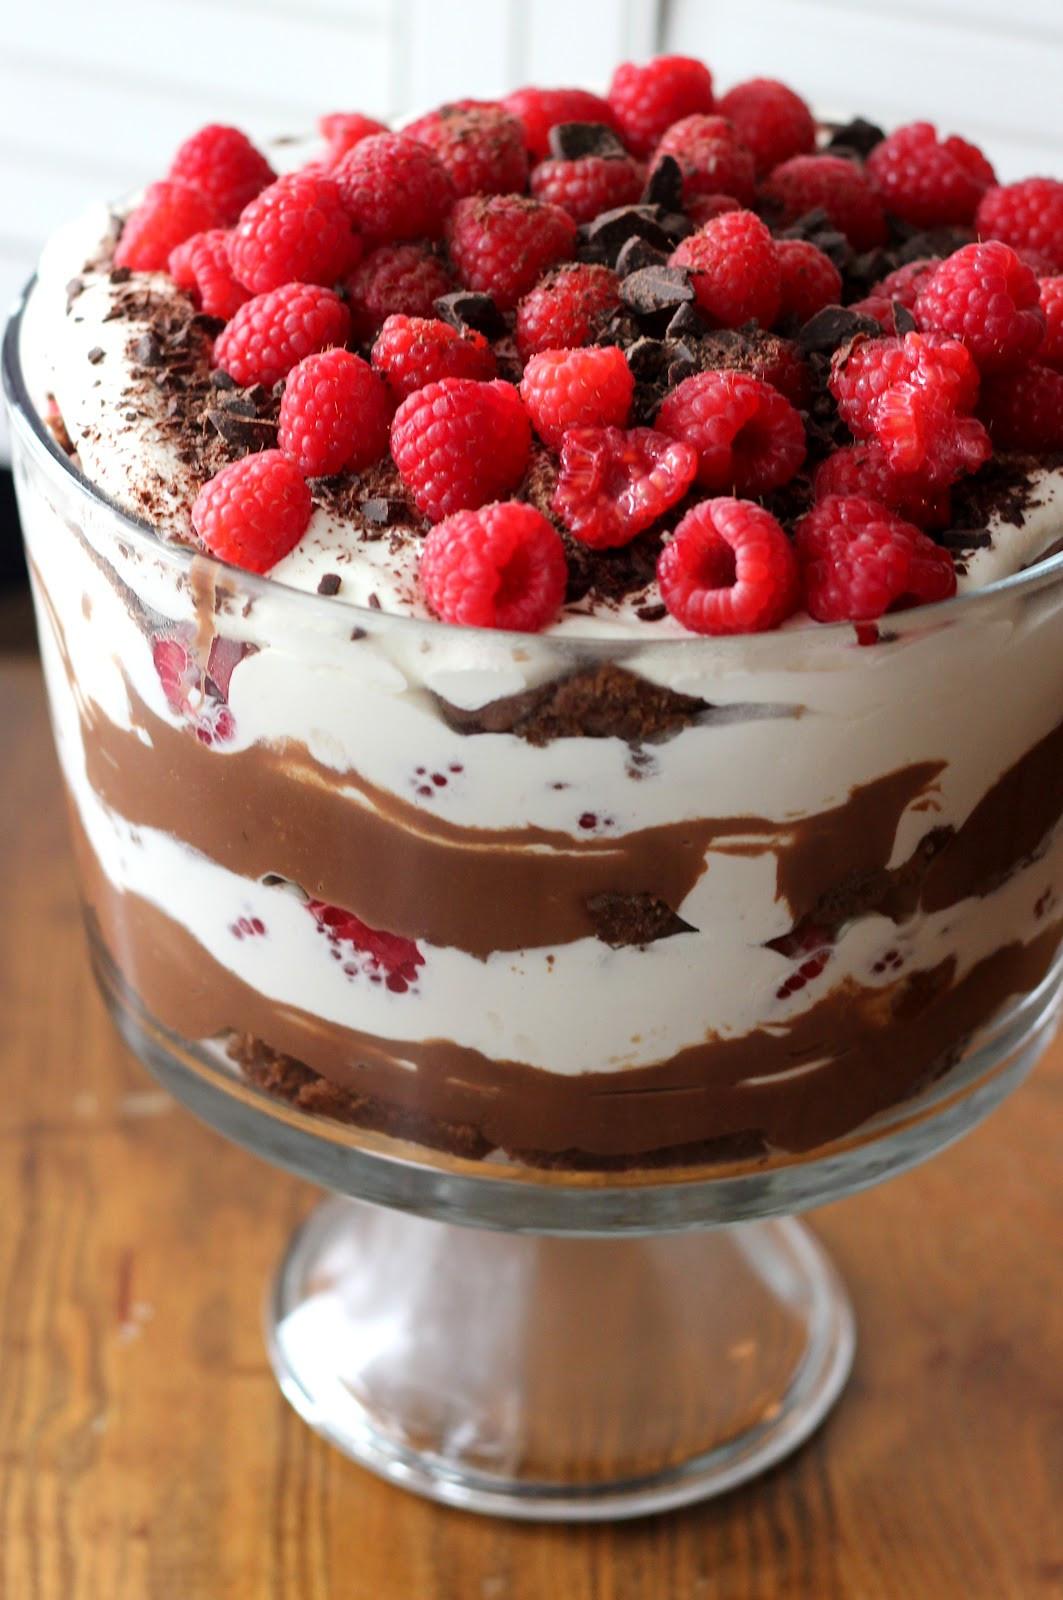 Chocolate Trifle Dessert  Triple Chocolate Trifle with Raspberries